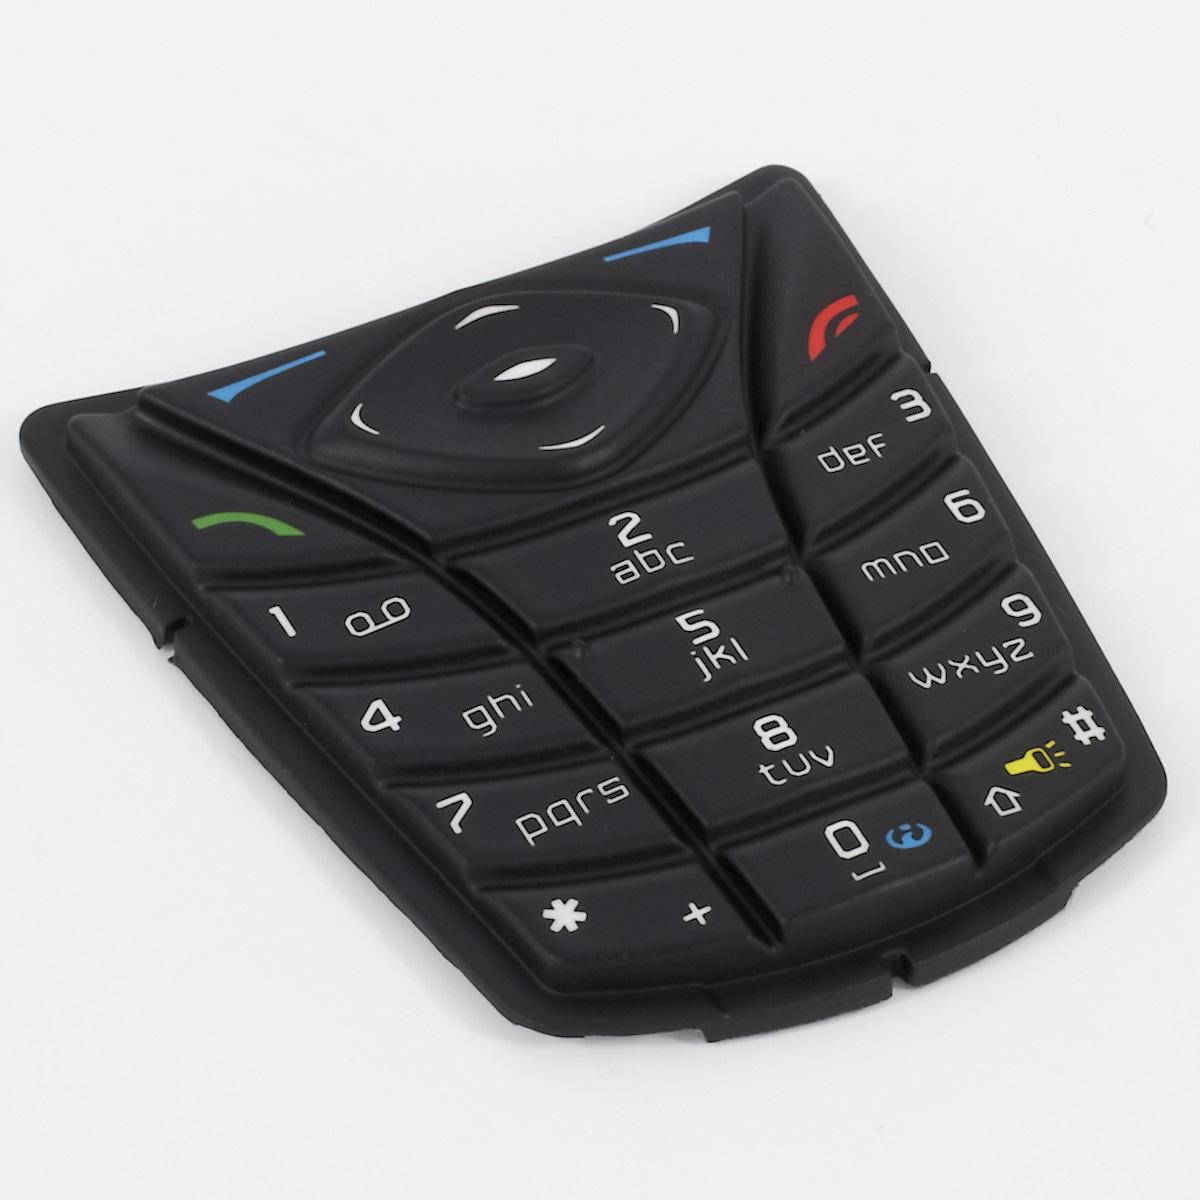 Tastenfeld Nokia 5140i